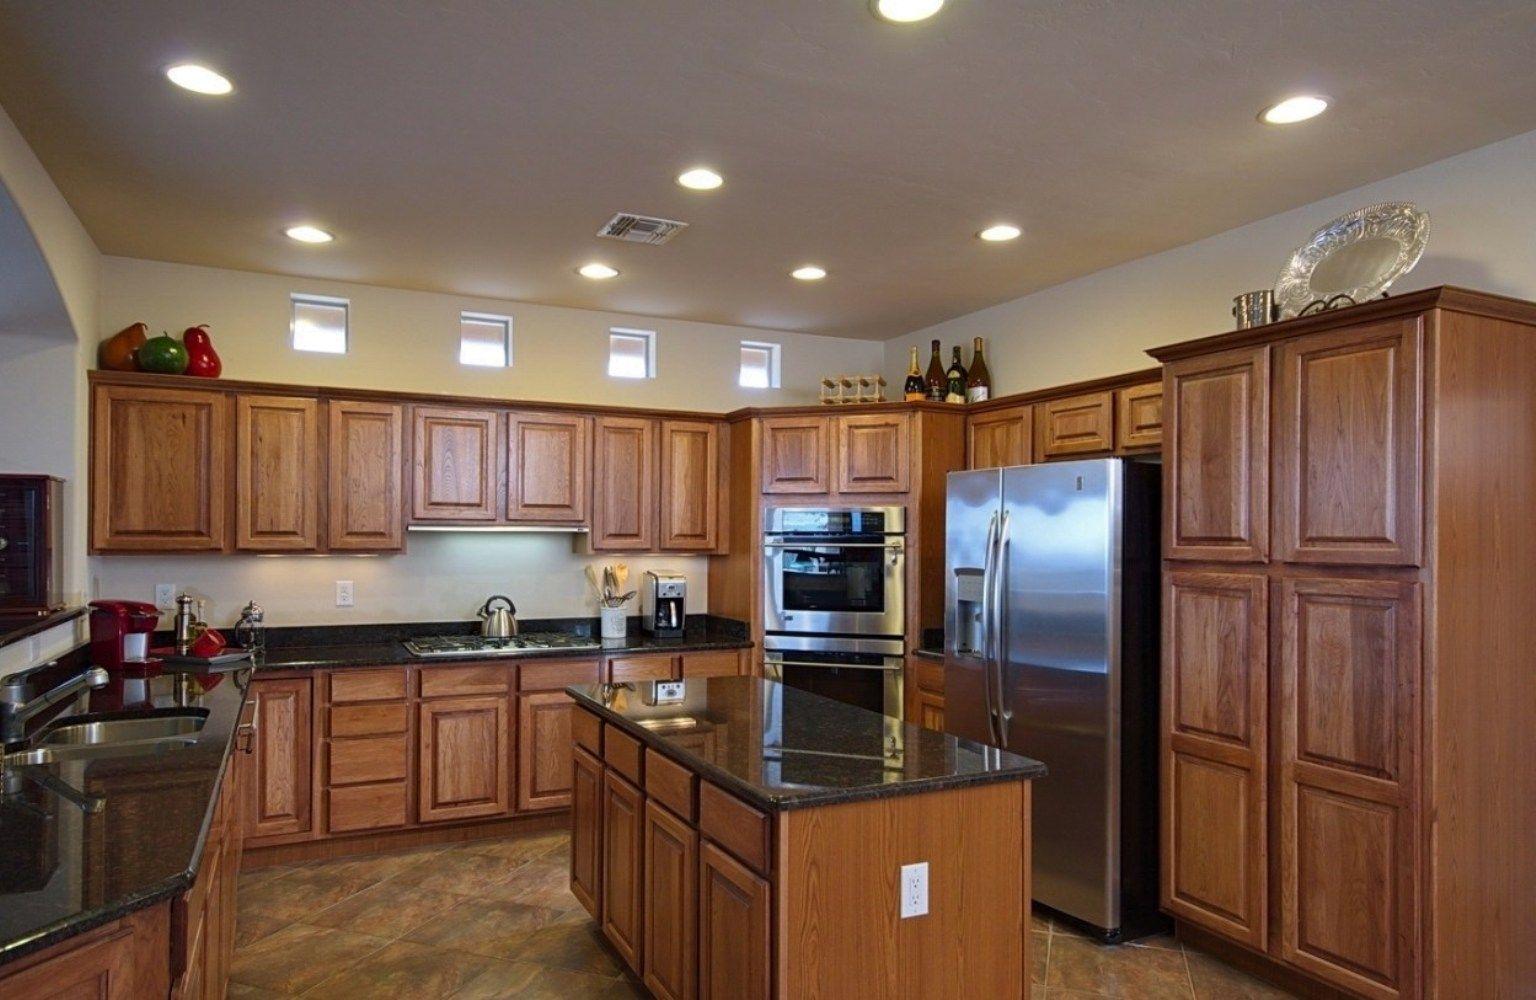 Hickory-Kitchen-Cabinet.jpg 1,536×1,000 pixels | Hickory ...